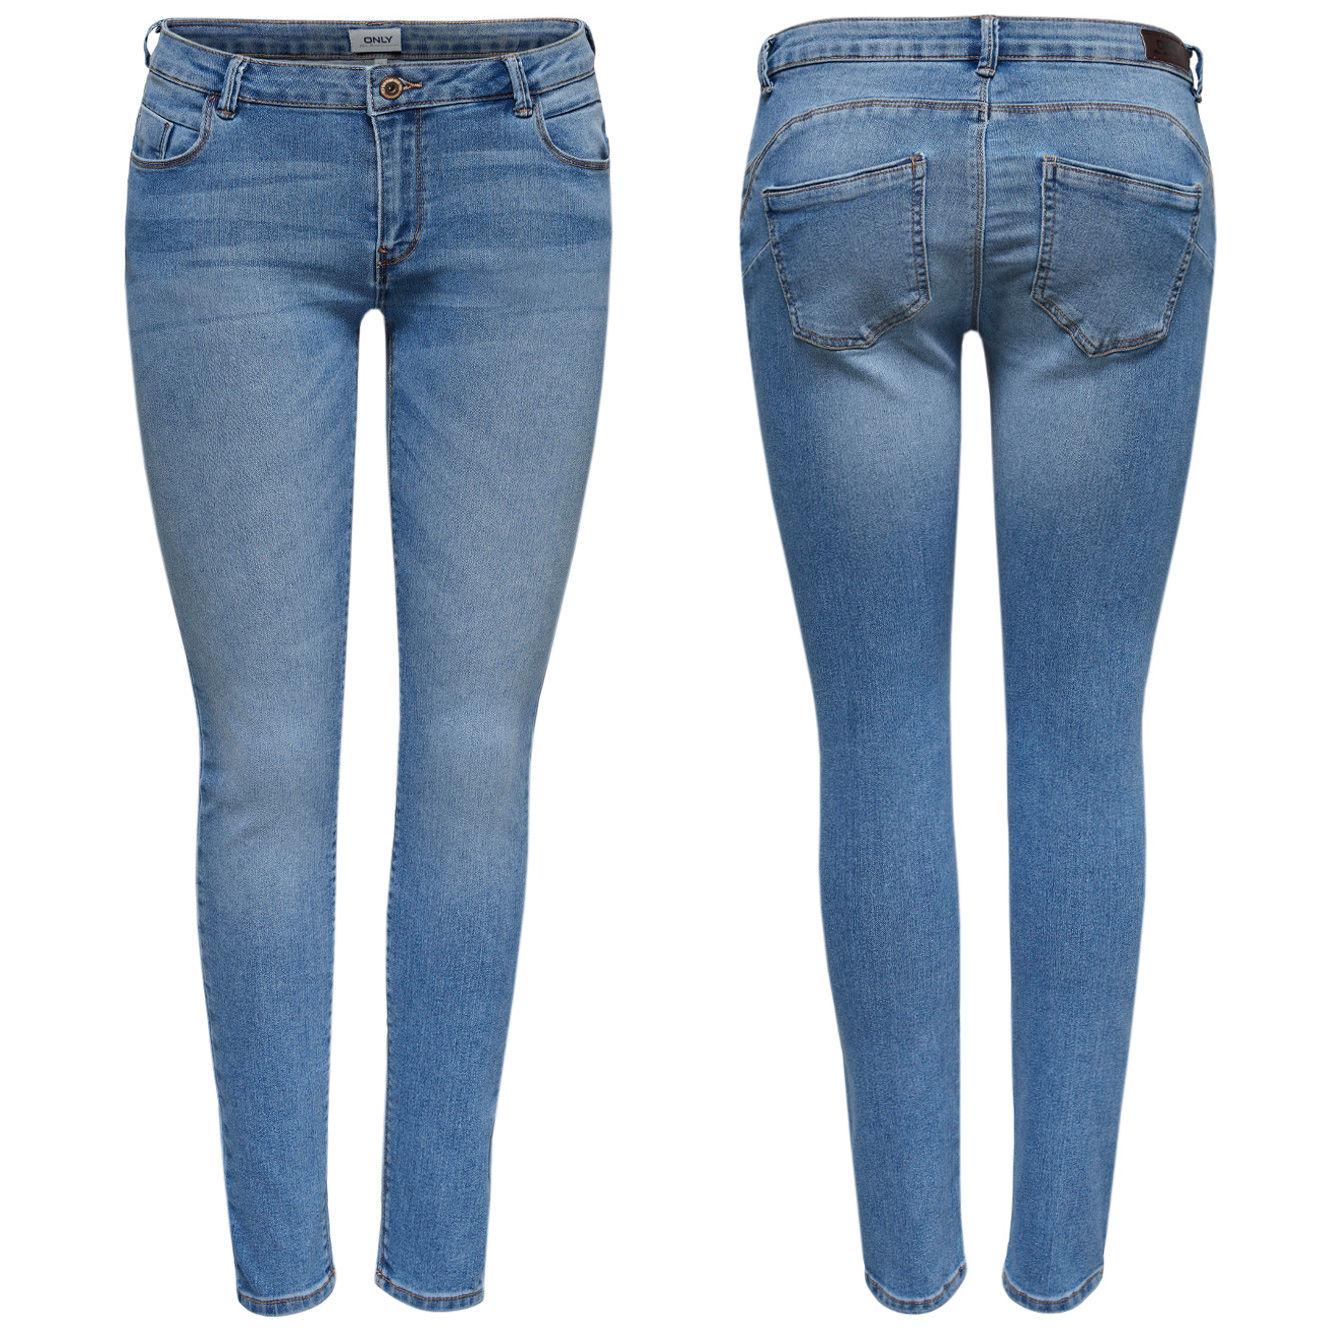 a41a48146245 ONLY Damen Jeans Hose onlDYLAN LOW SK ANK PUSHUP skinny denim mittelblau  knöchelfrei